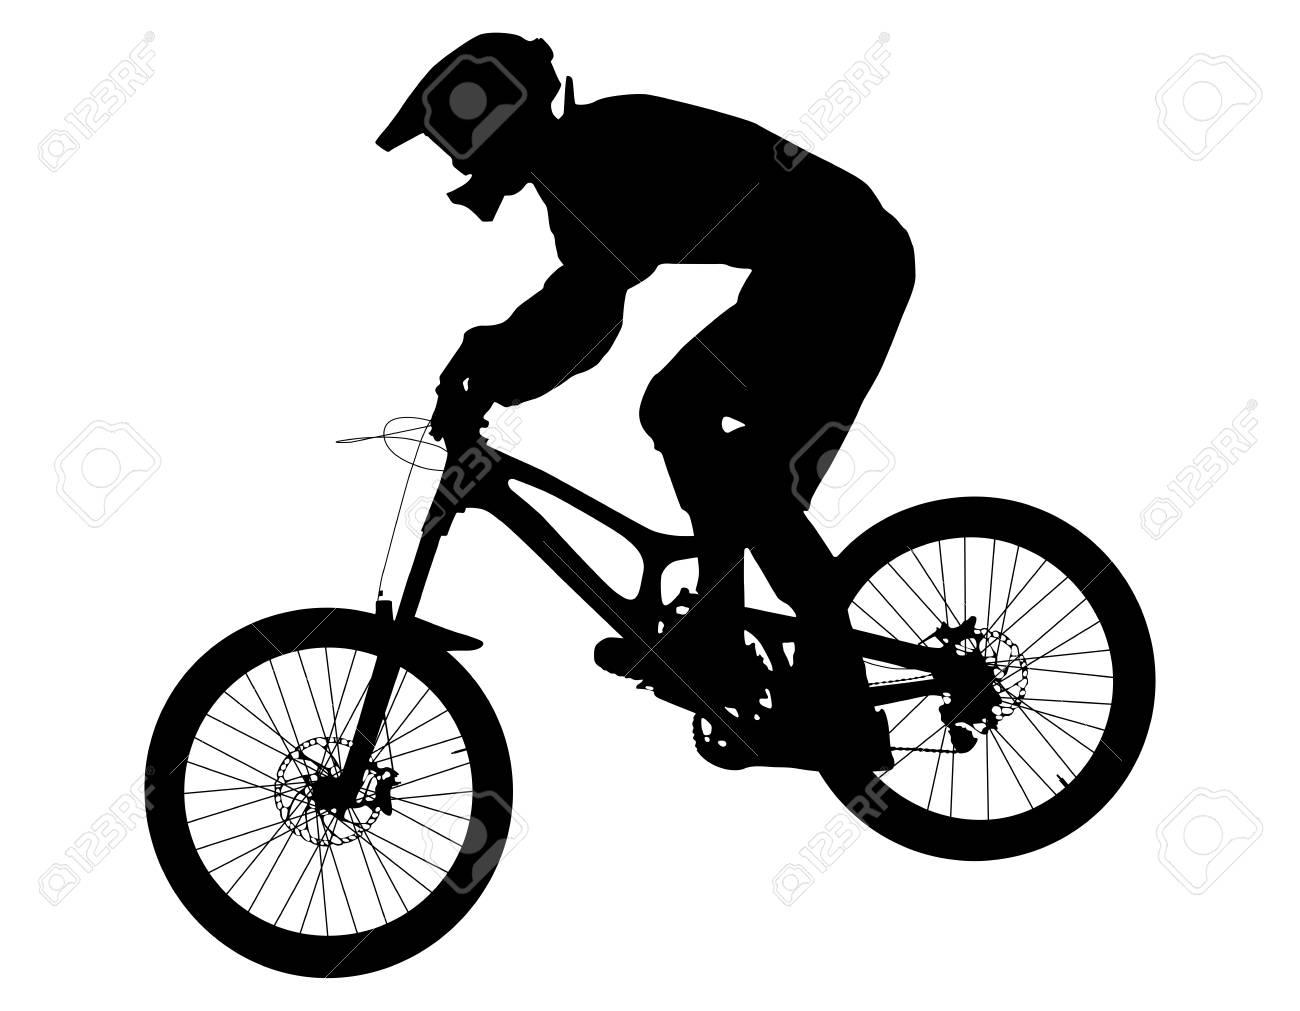 Athlete Rider On Bike Mountain Biking Black Silhouette Royalty Free